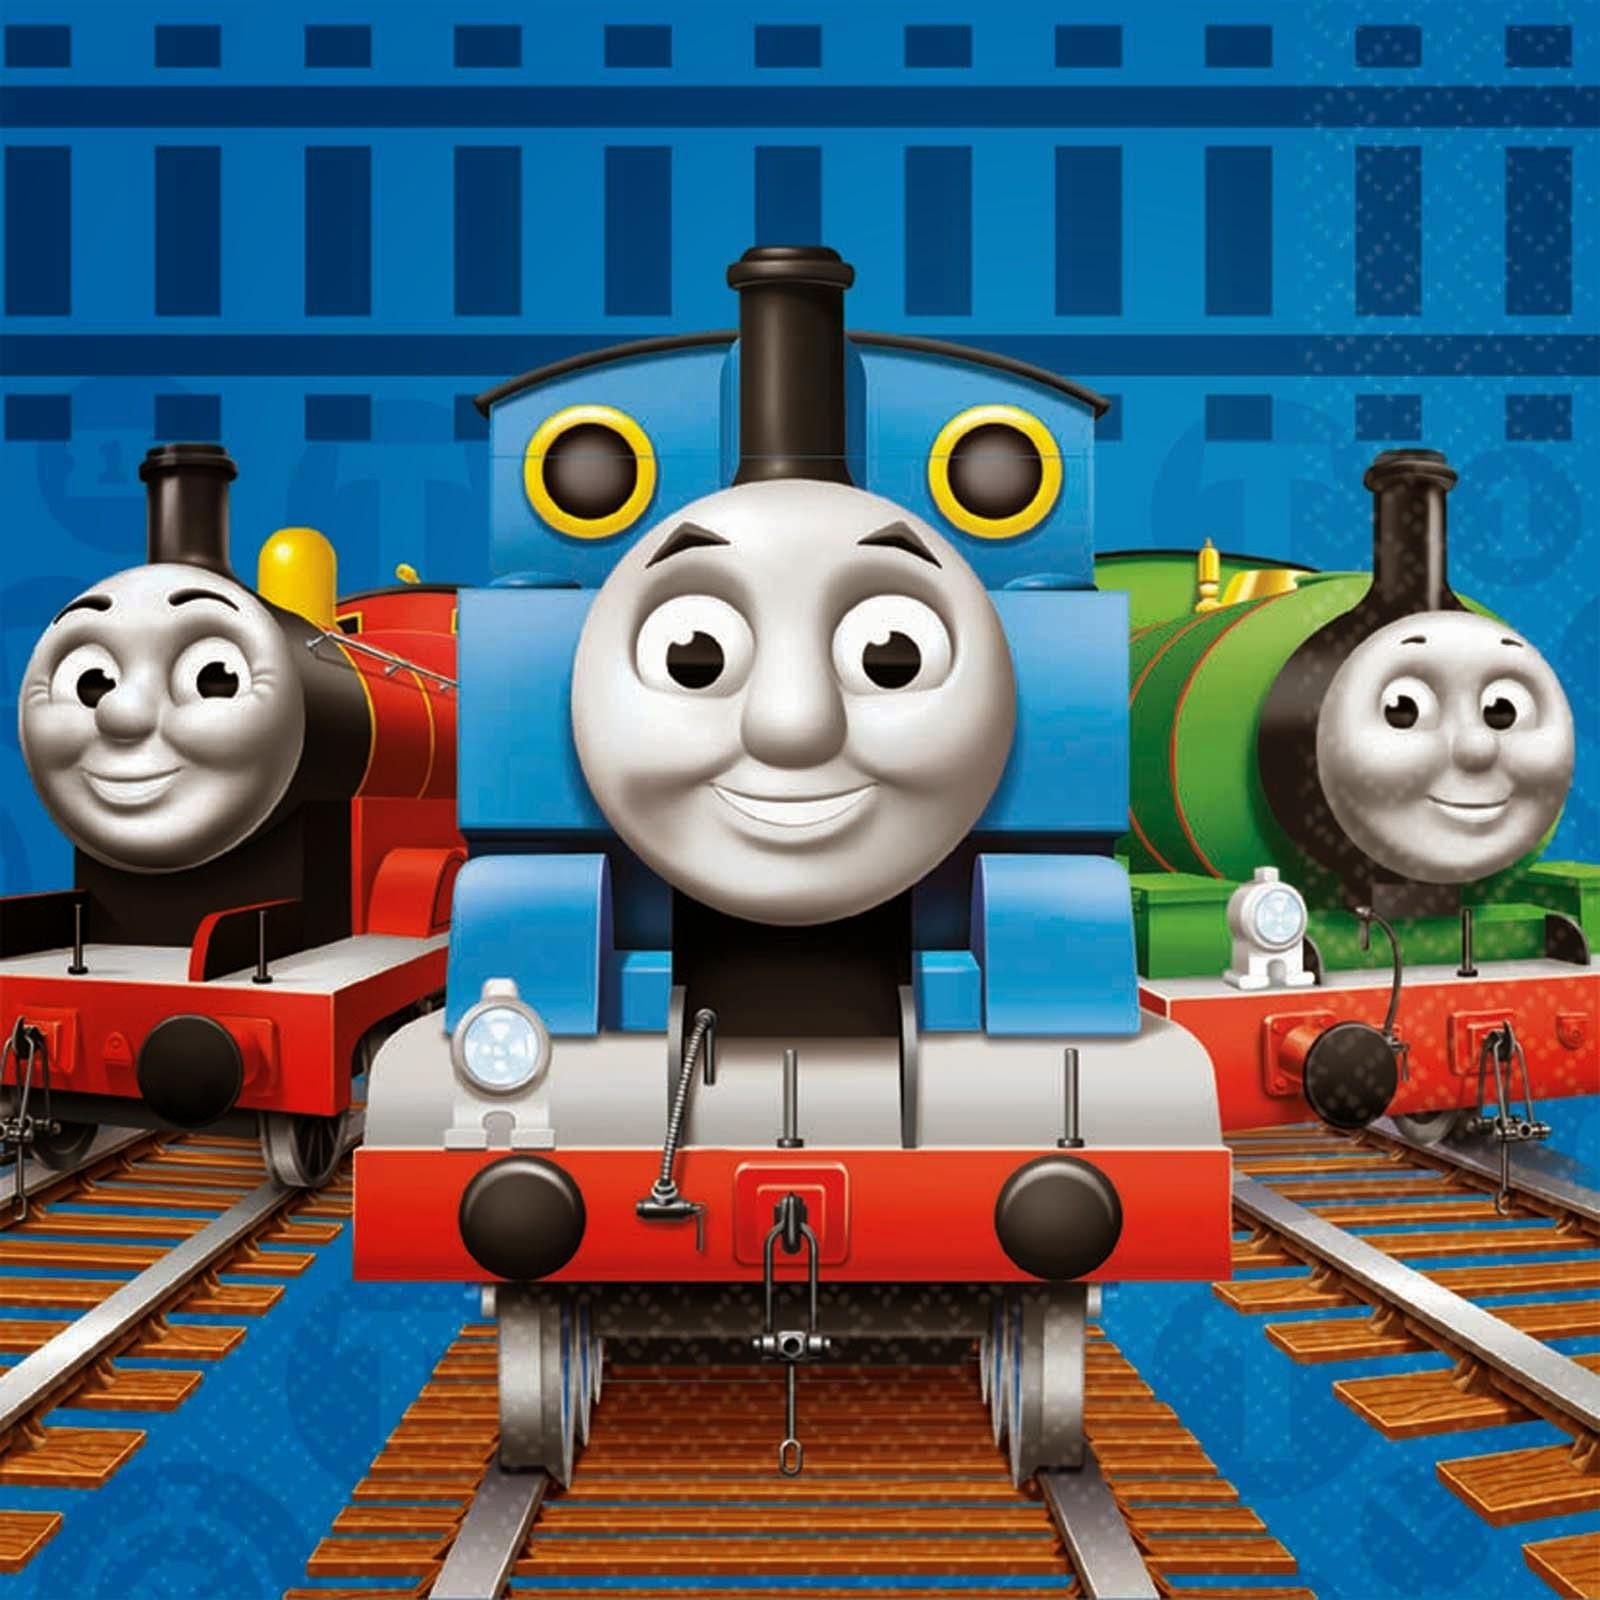 kumpulan gambar thomas the tank engine   friends gambar thomas the train clip art border thomas the train clip art border